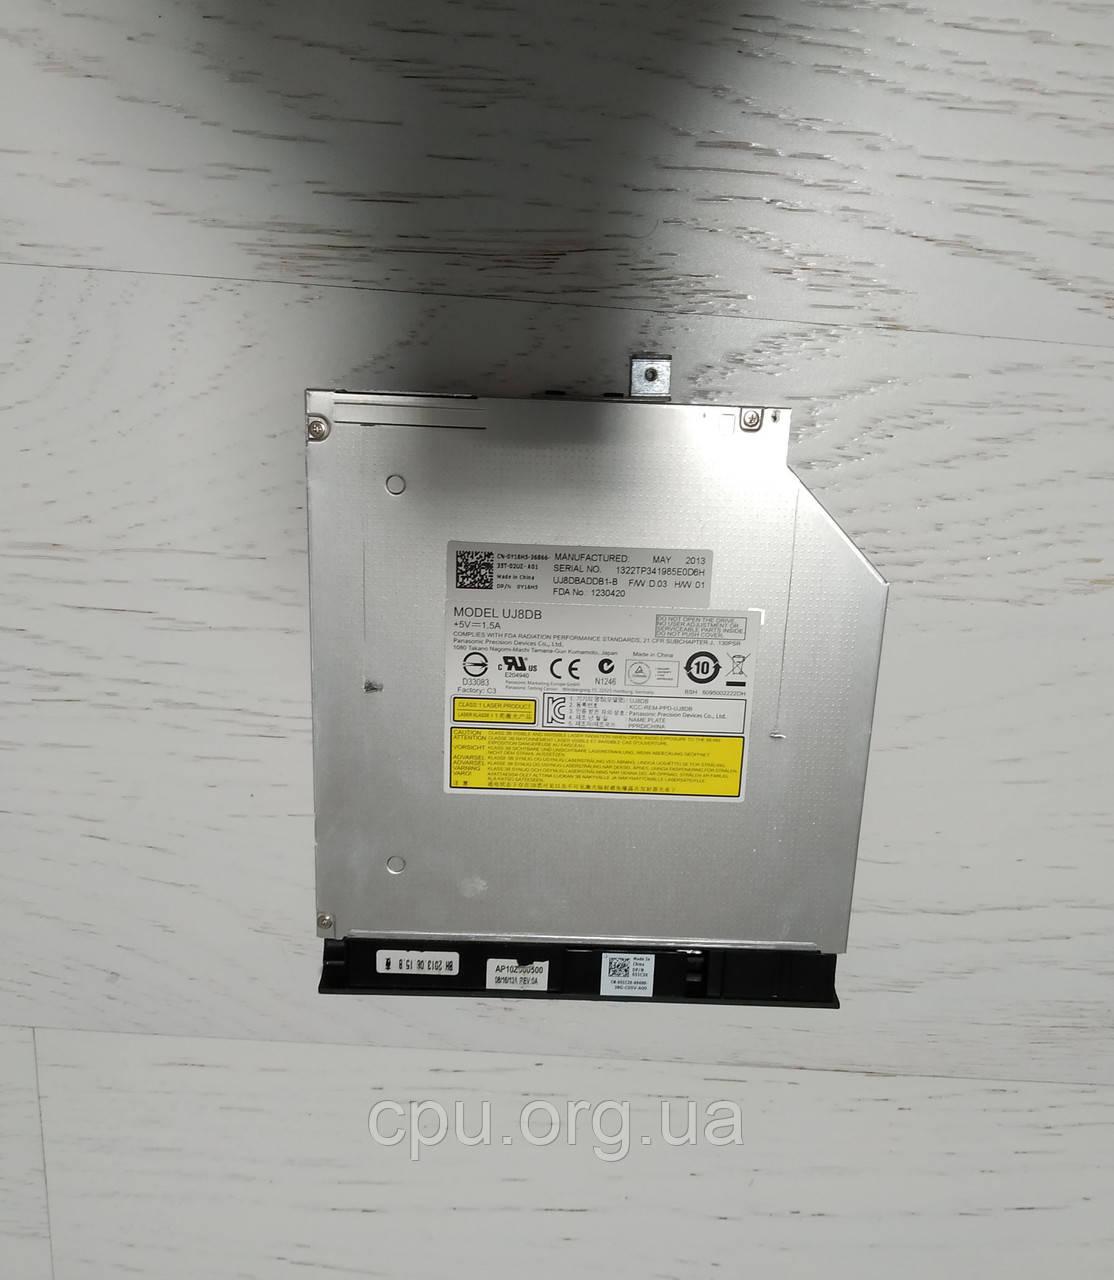 Dell Latitude 3540 DVD привод с пластиковой накладкой